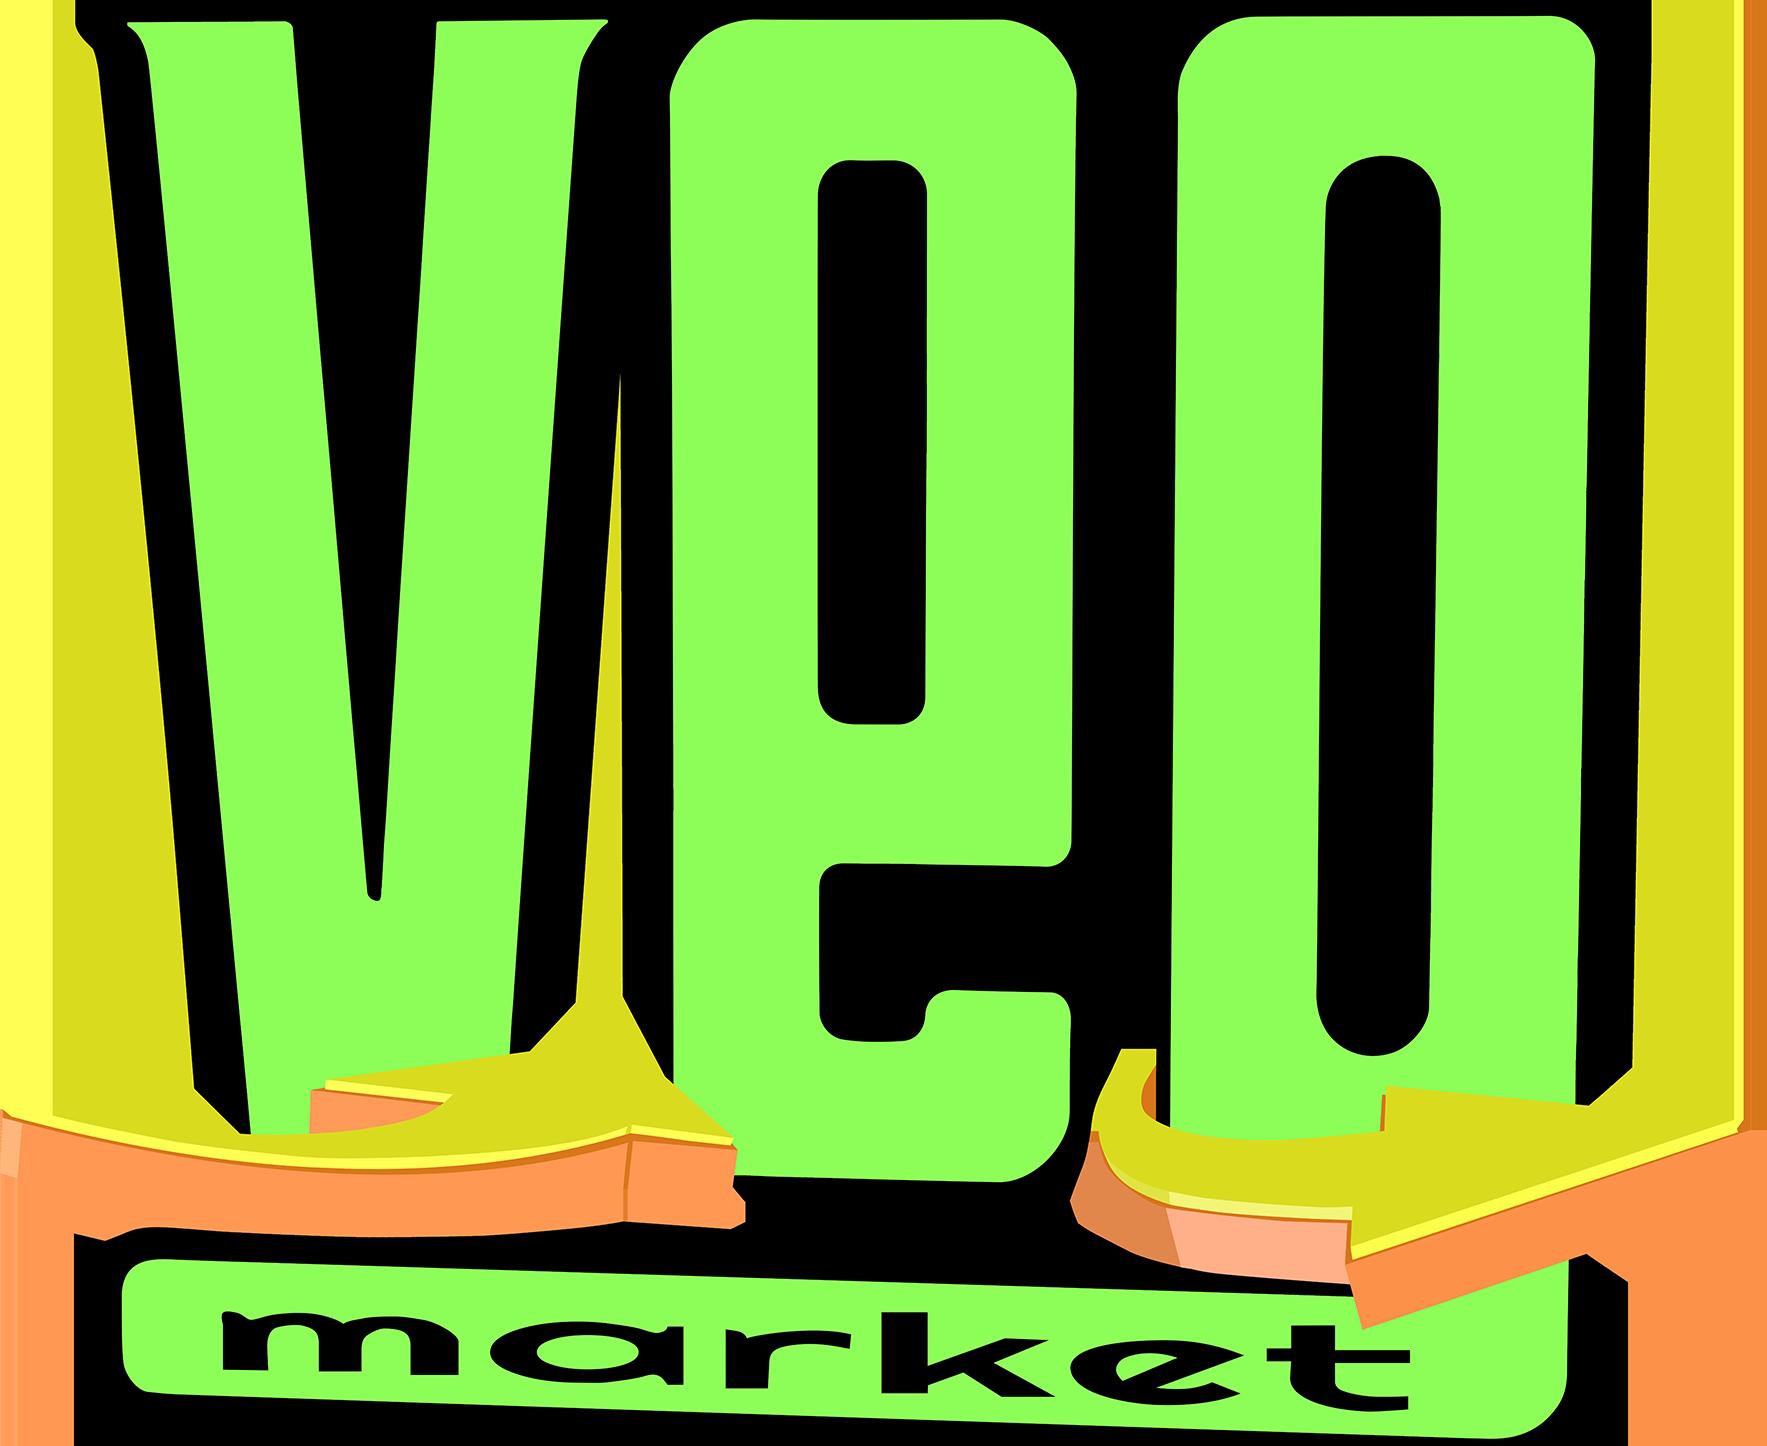 Veg-In-Out Market logo